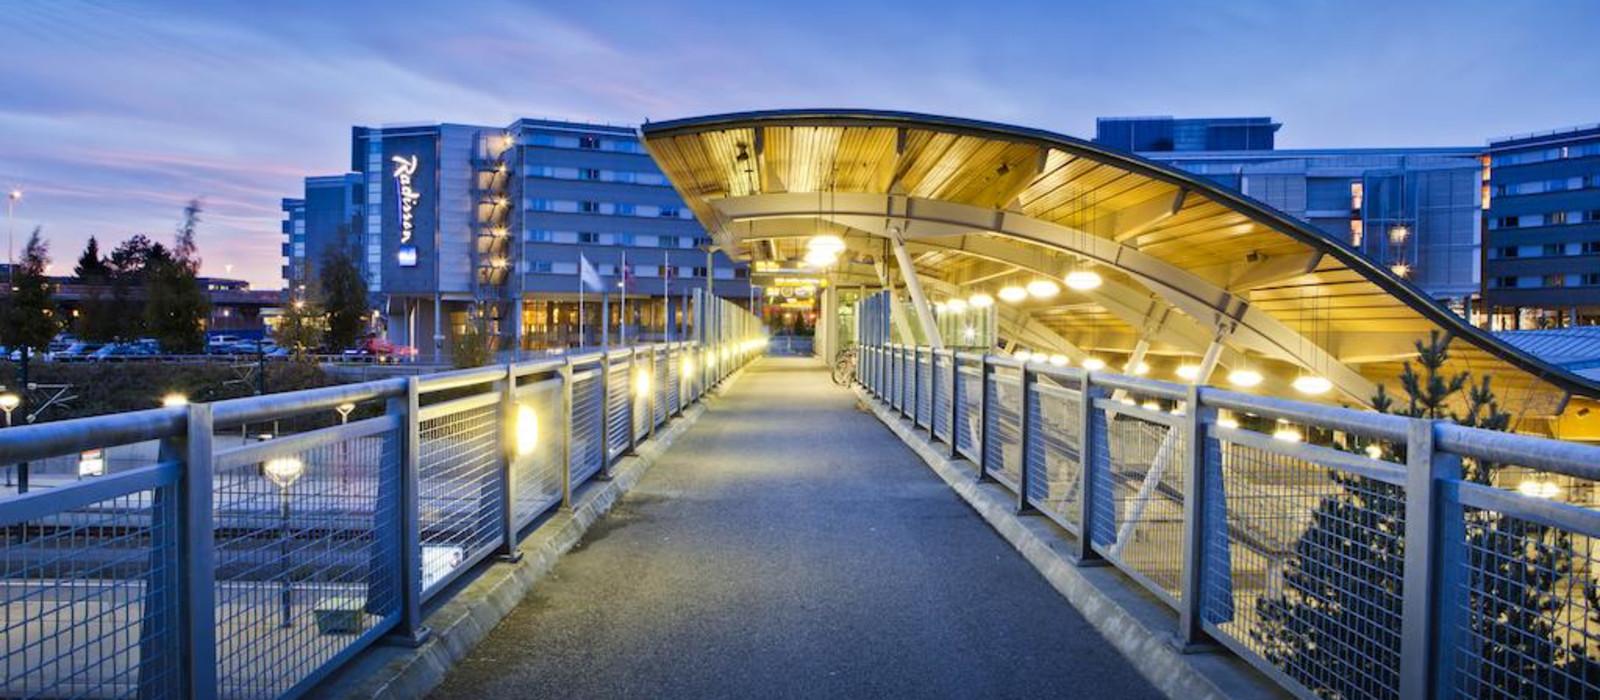 Hotel Radisson Blu Airport  Oslo Gardermoen Arktis